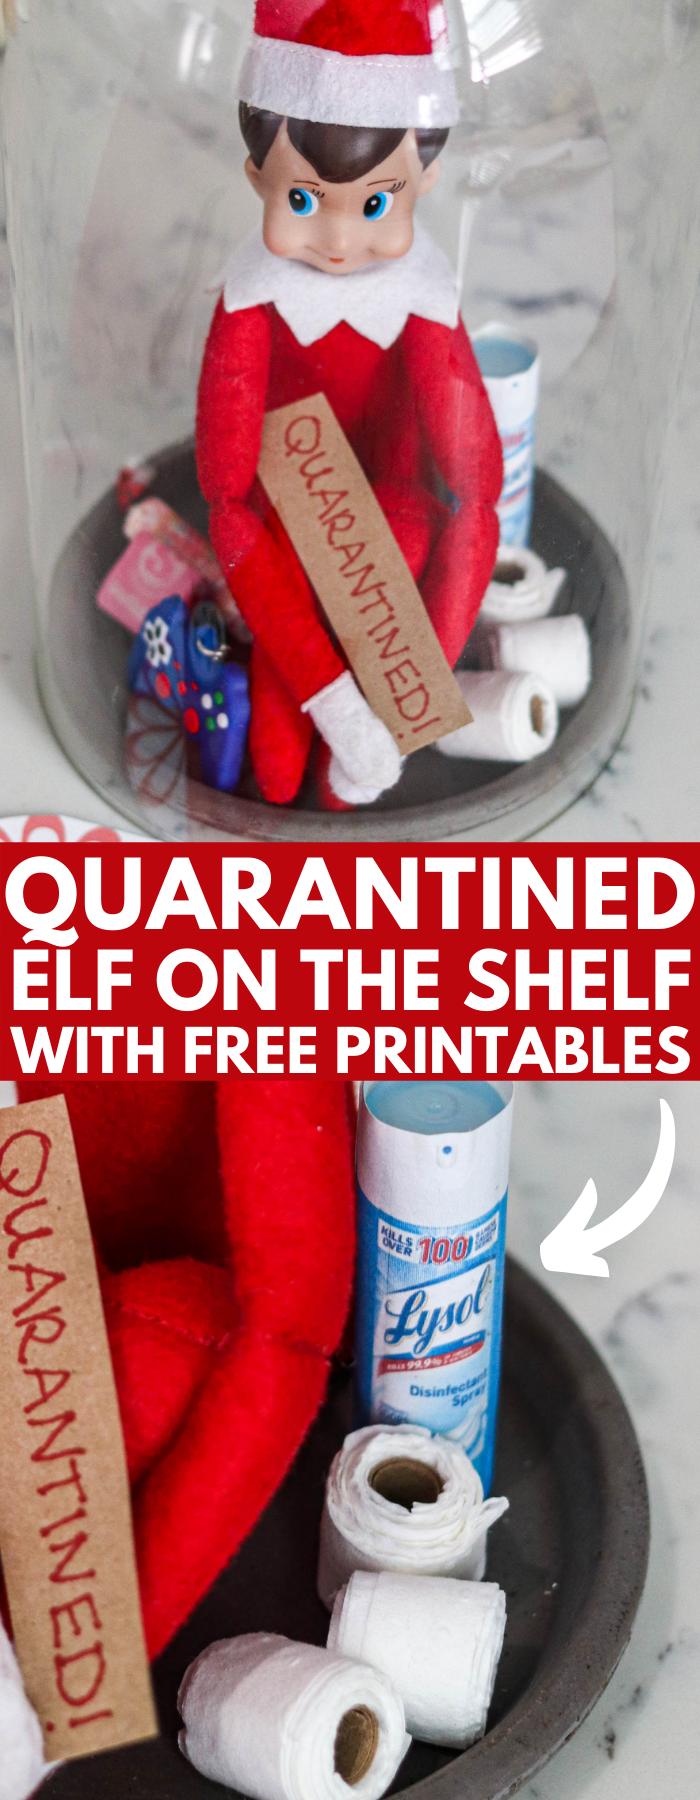 Diy Quarantined Elf On The Shelf Free Printables Elf On The Shelf Elf Homemade Christmas Gifts